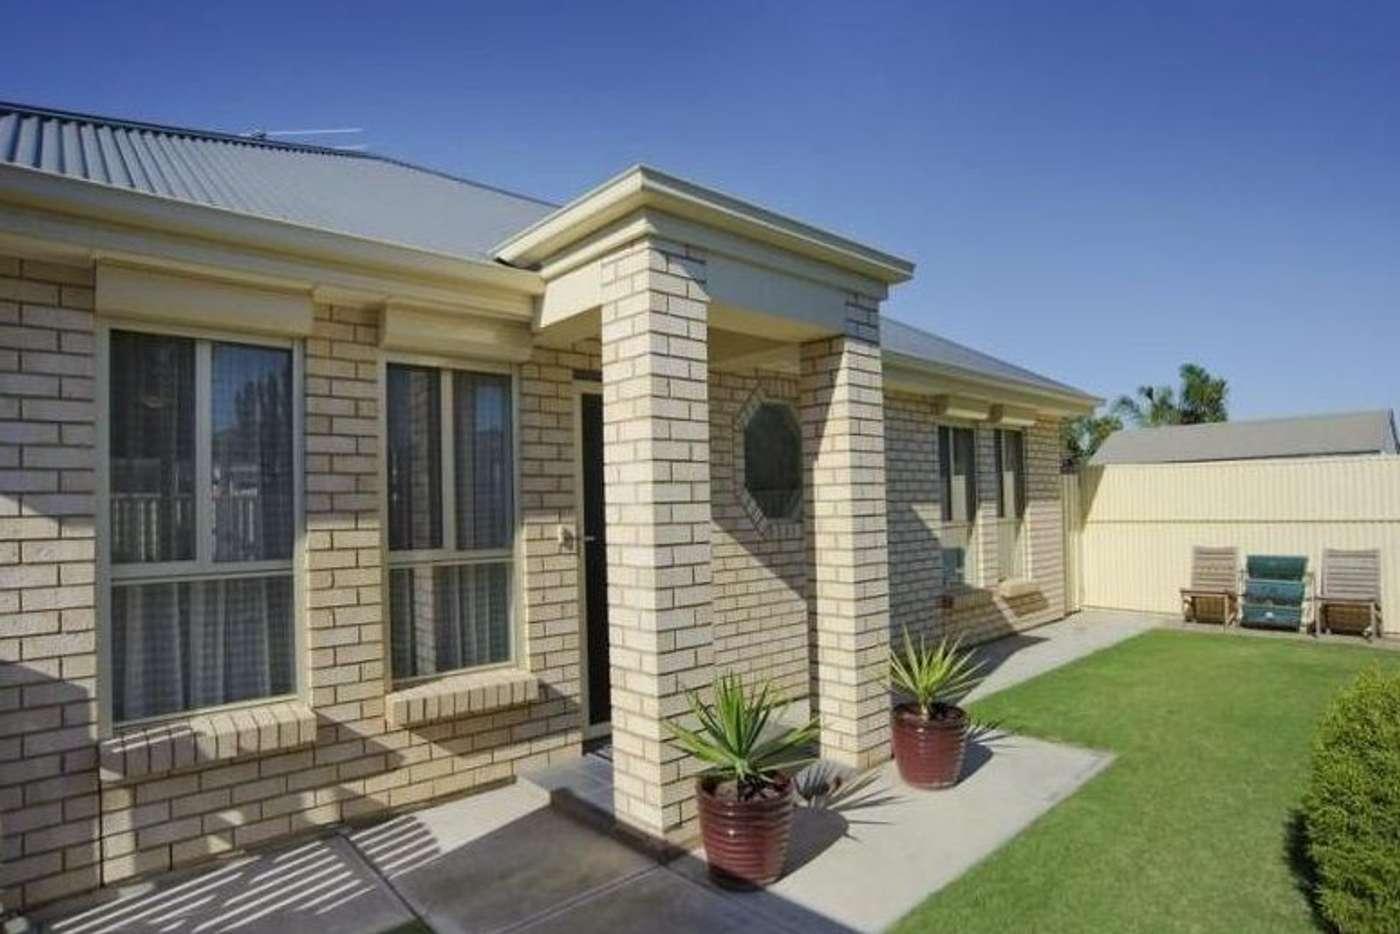 Main view of Homely house listing, 12 Workman Street, Birkenhead SA 5015